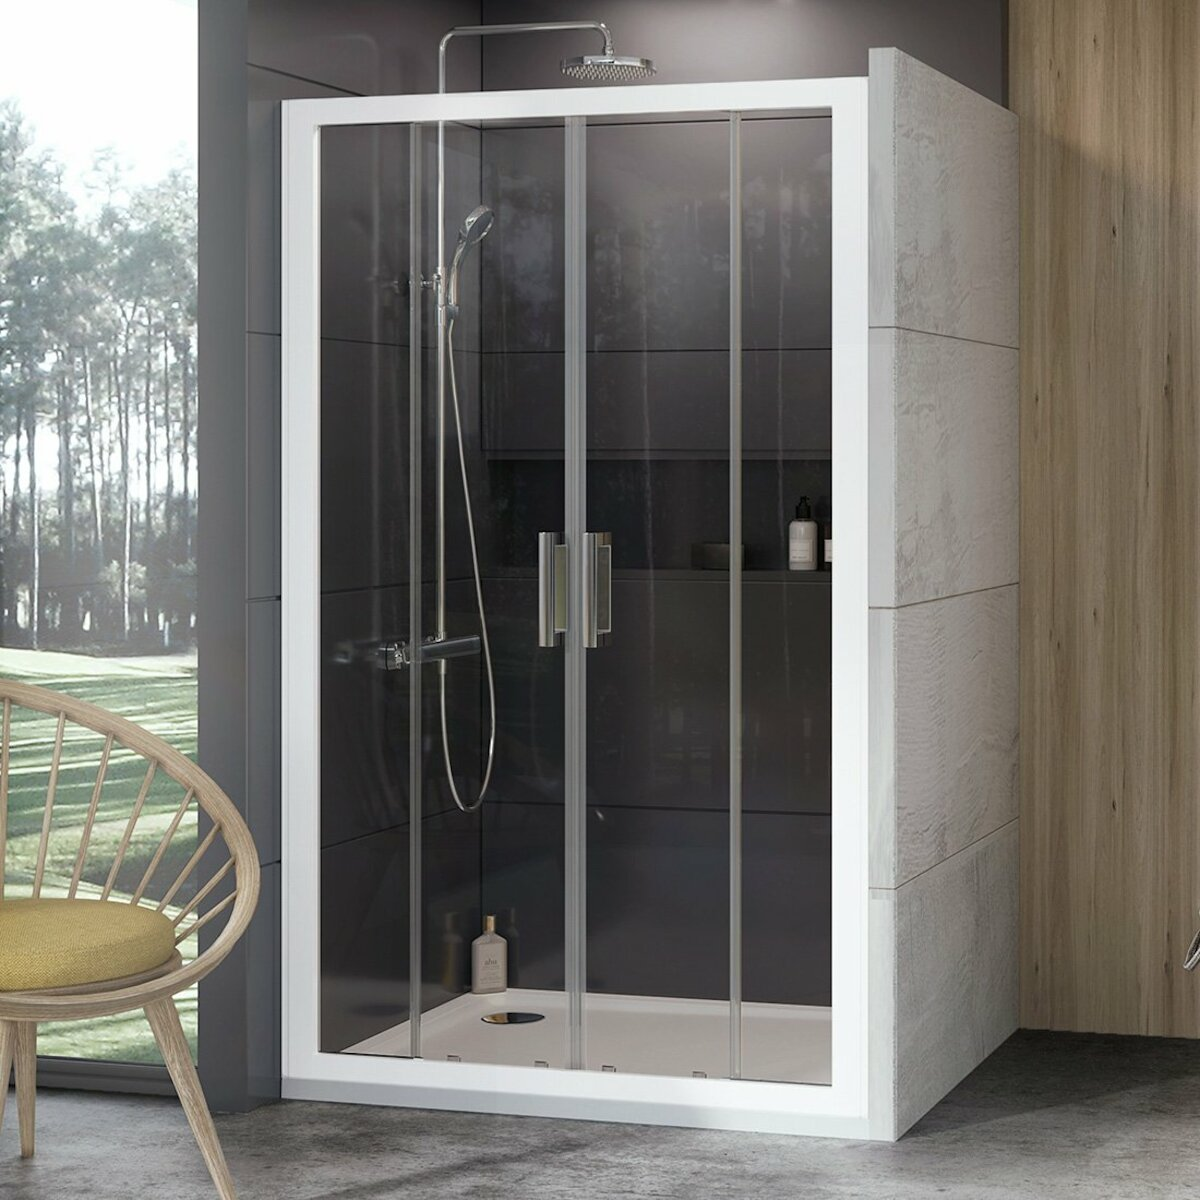 Sprchové dvere 140x190 cm Ravak 10° biela 0ZKM0100Z1